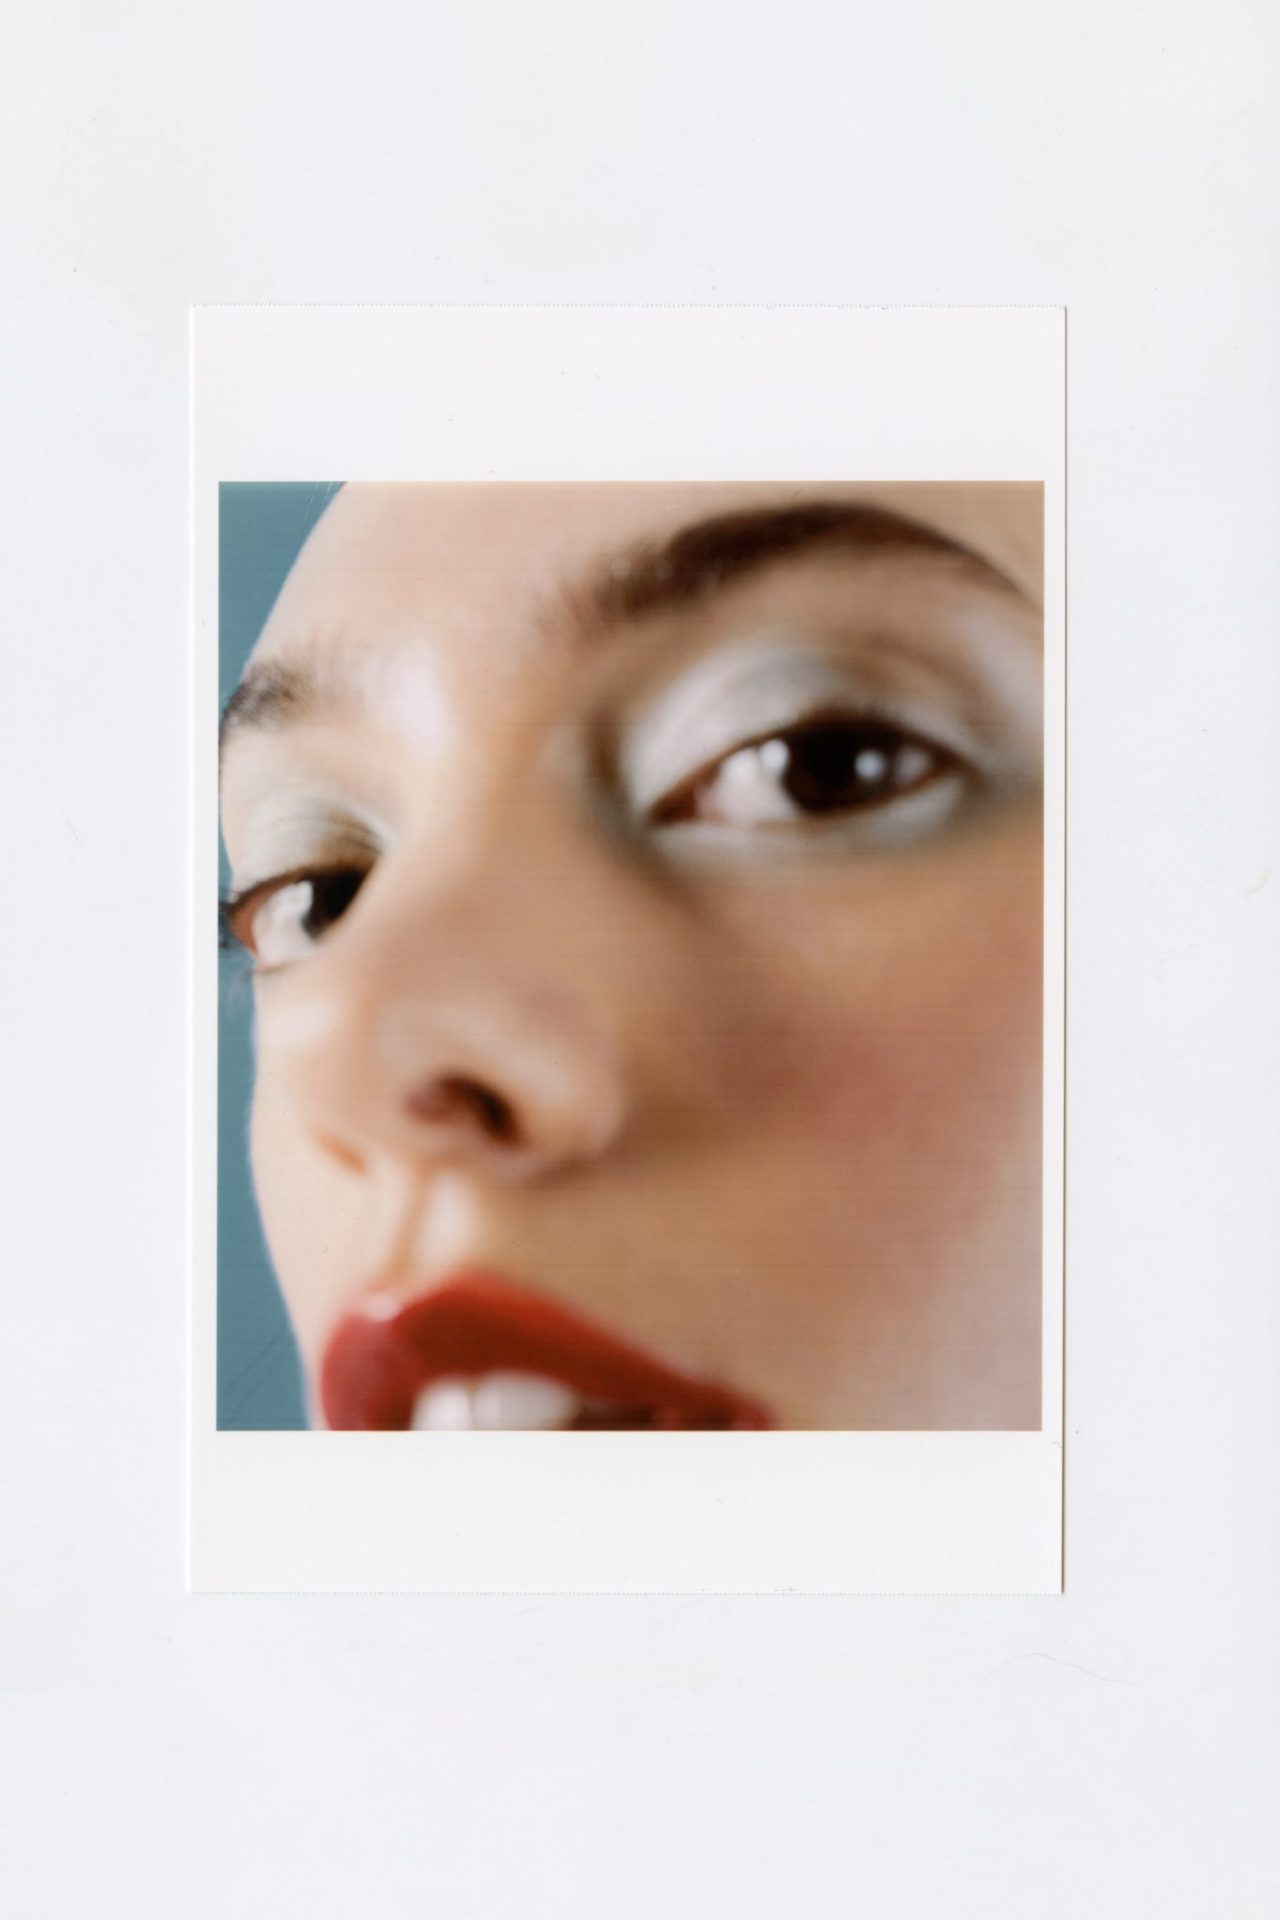 marcello-junior-dino-goerge-wood-webber-jungle-magazine-editorial